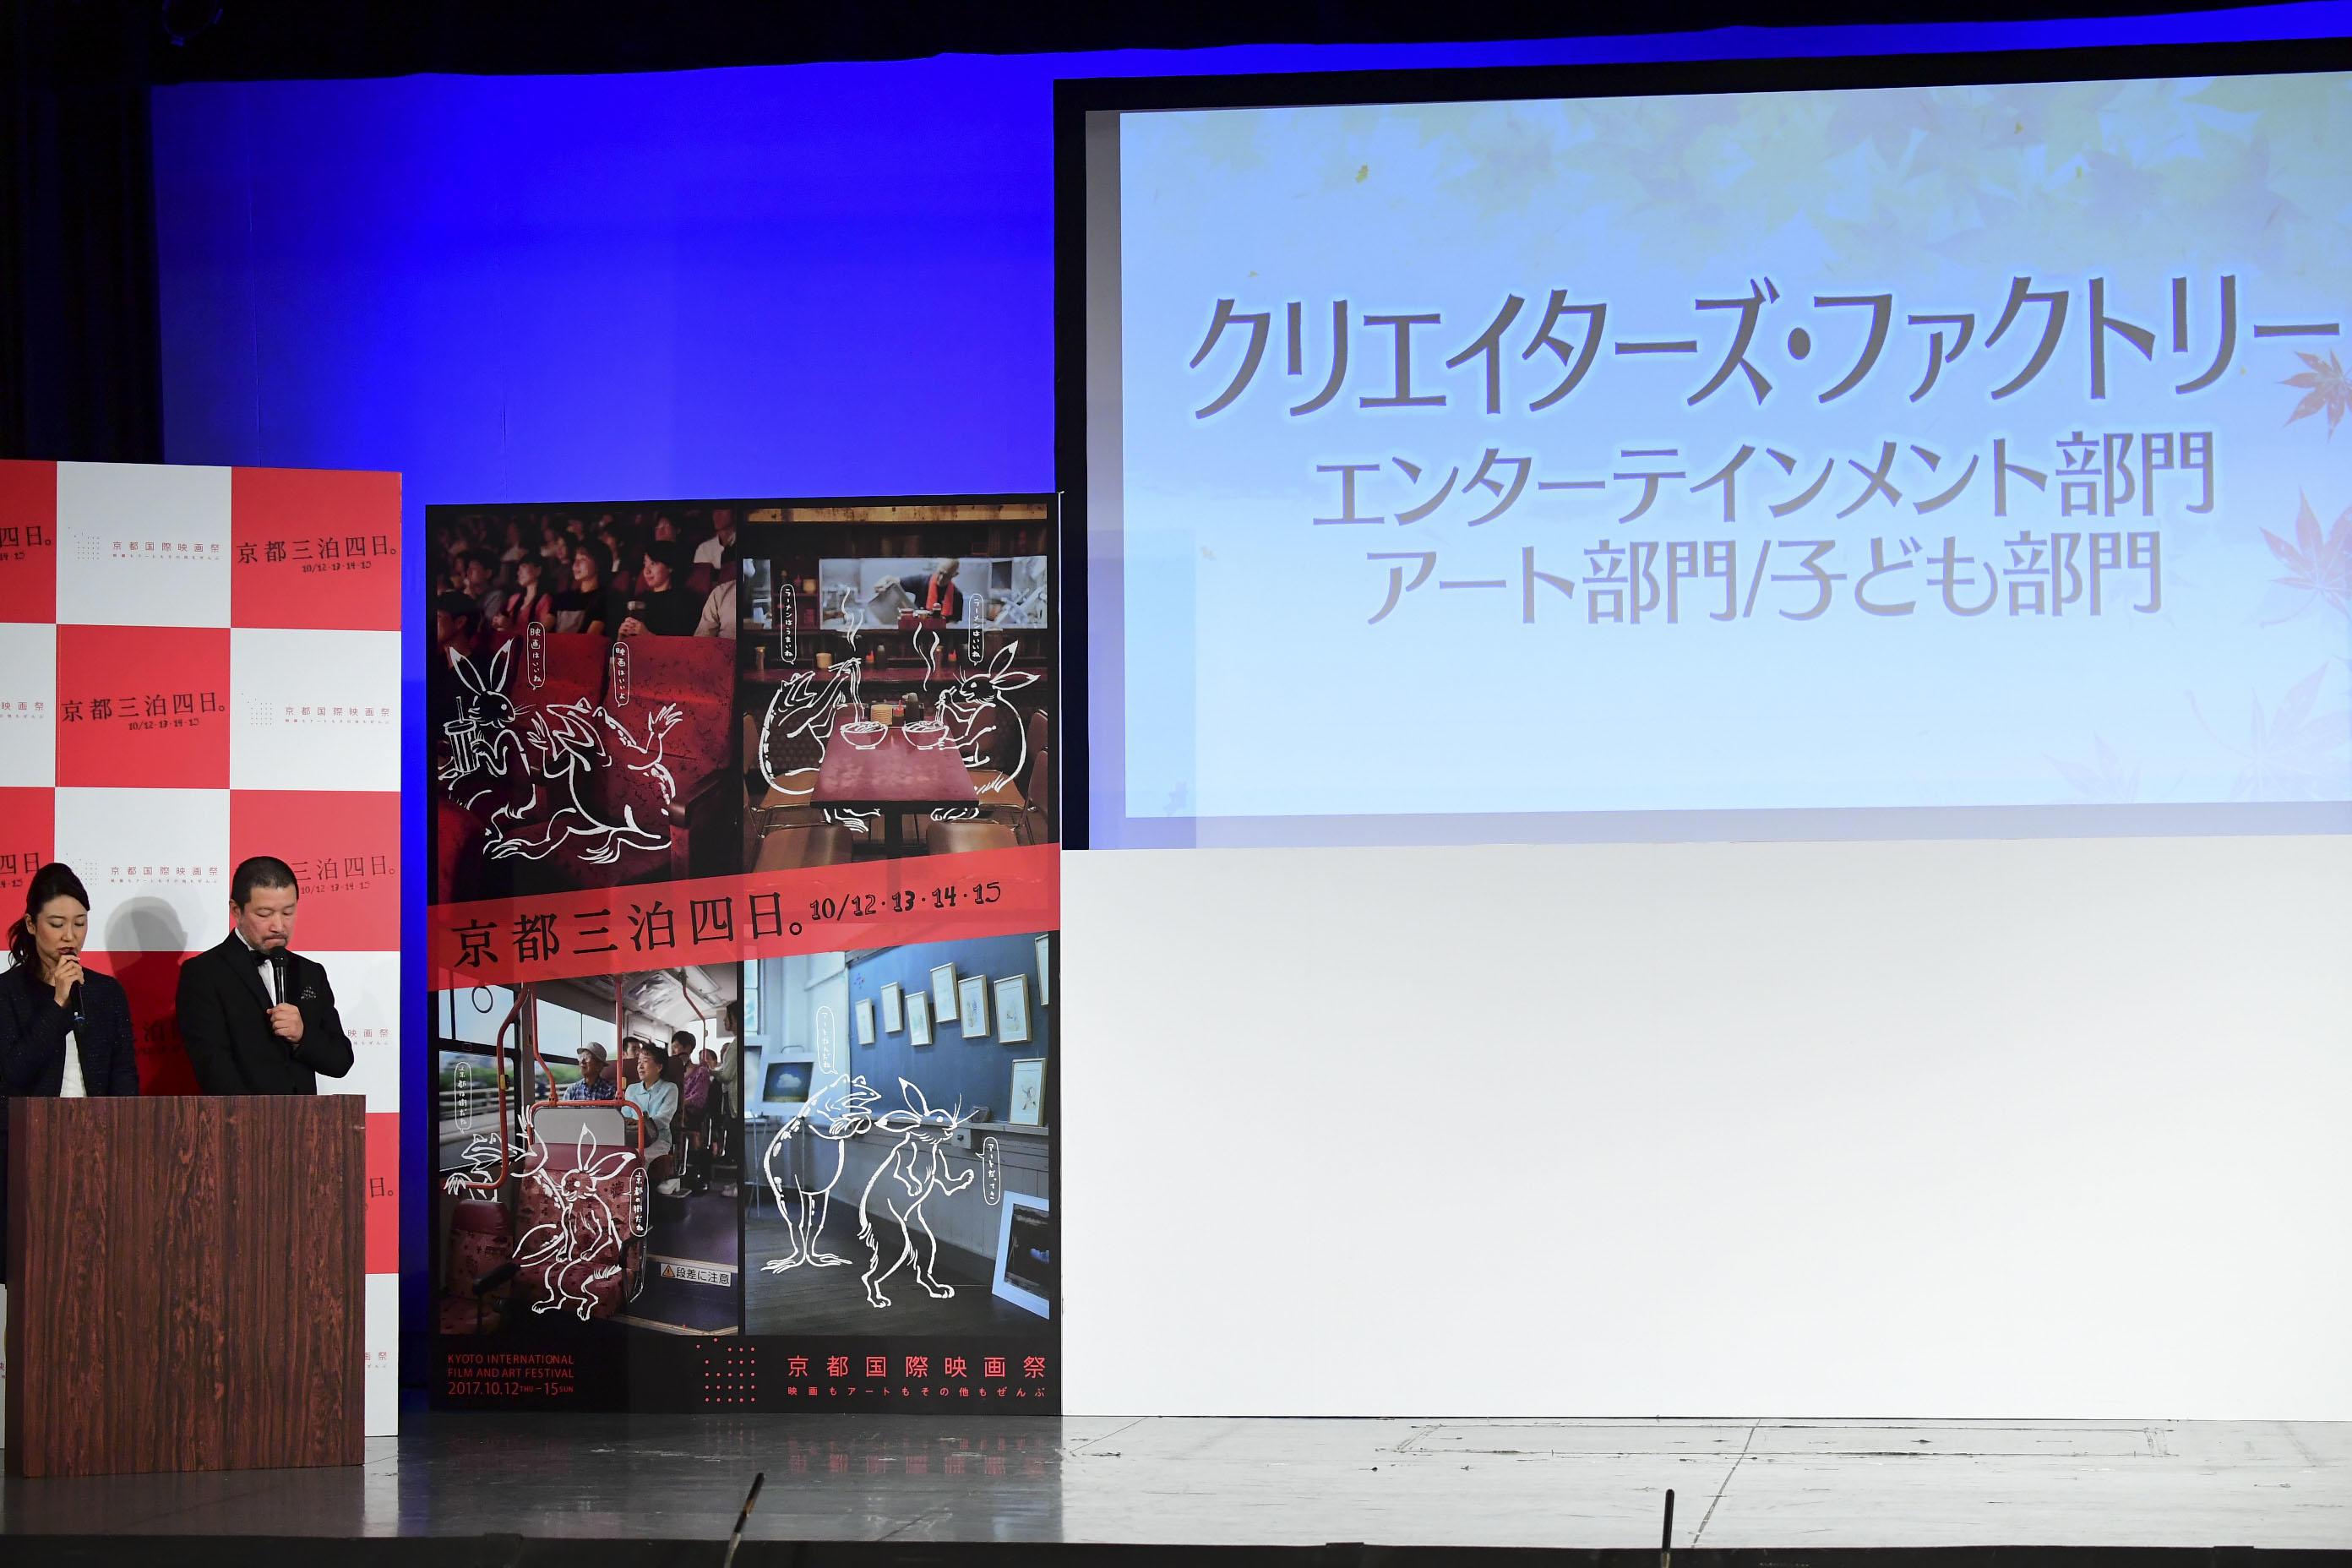 http://news.yoshimoto.co.jp/20170907022212-af7cb2dab4a74b3218e7c398872e08887c0e9b26.jpg